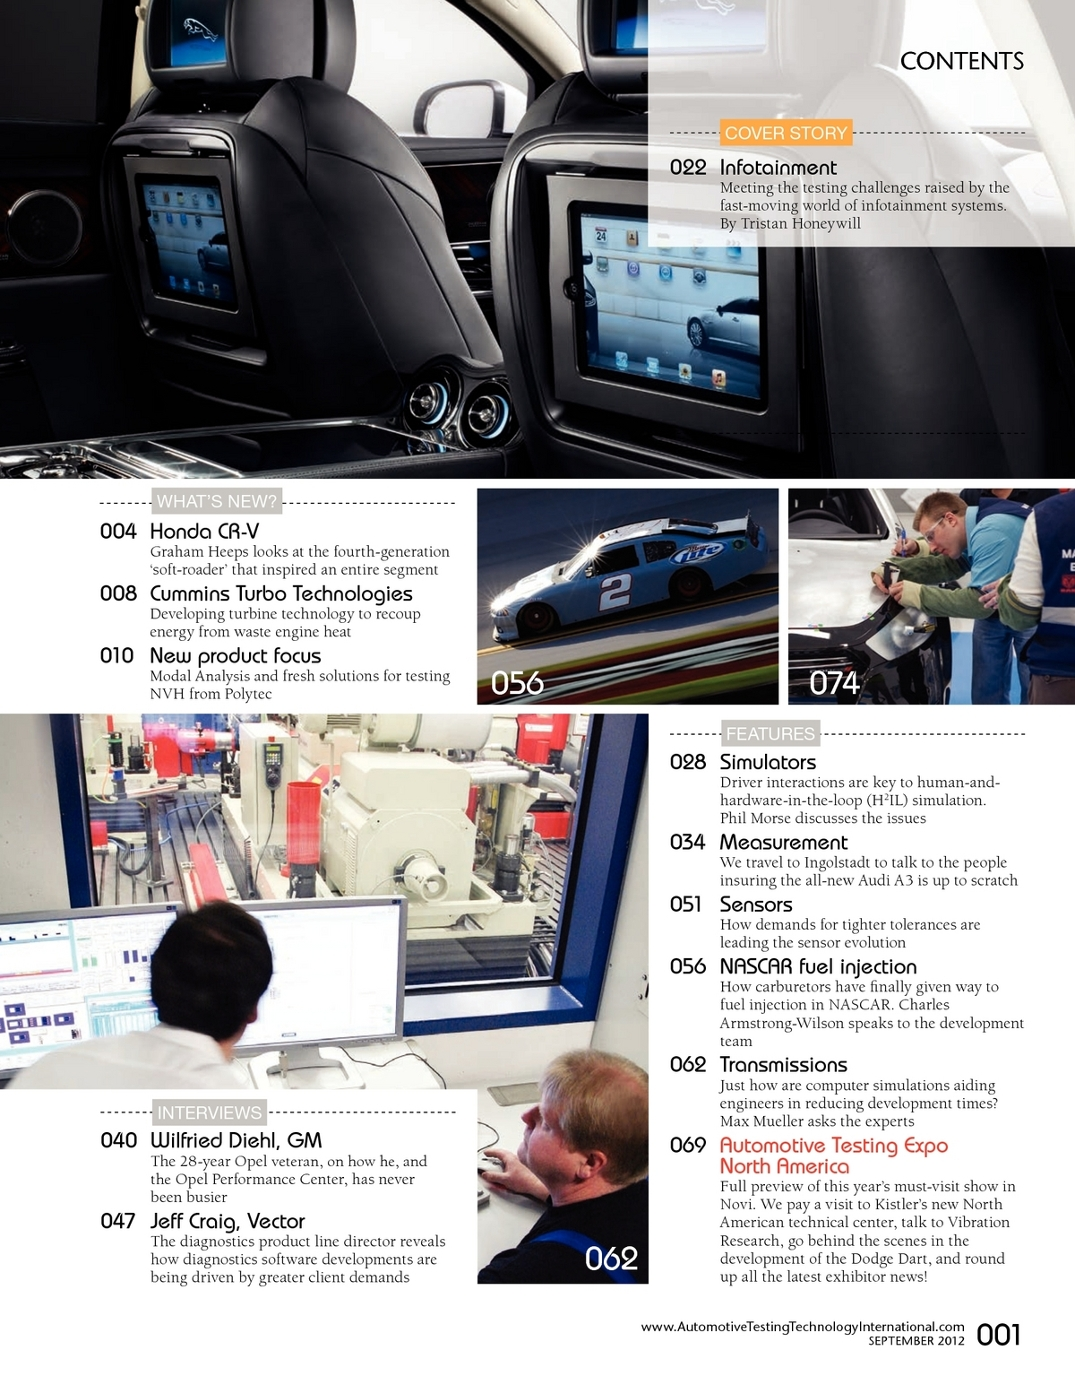 September 2012 Automotive Testing Technology International - UKi